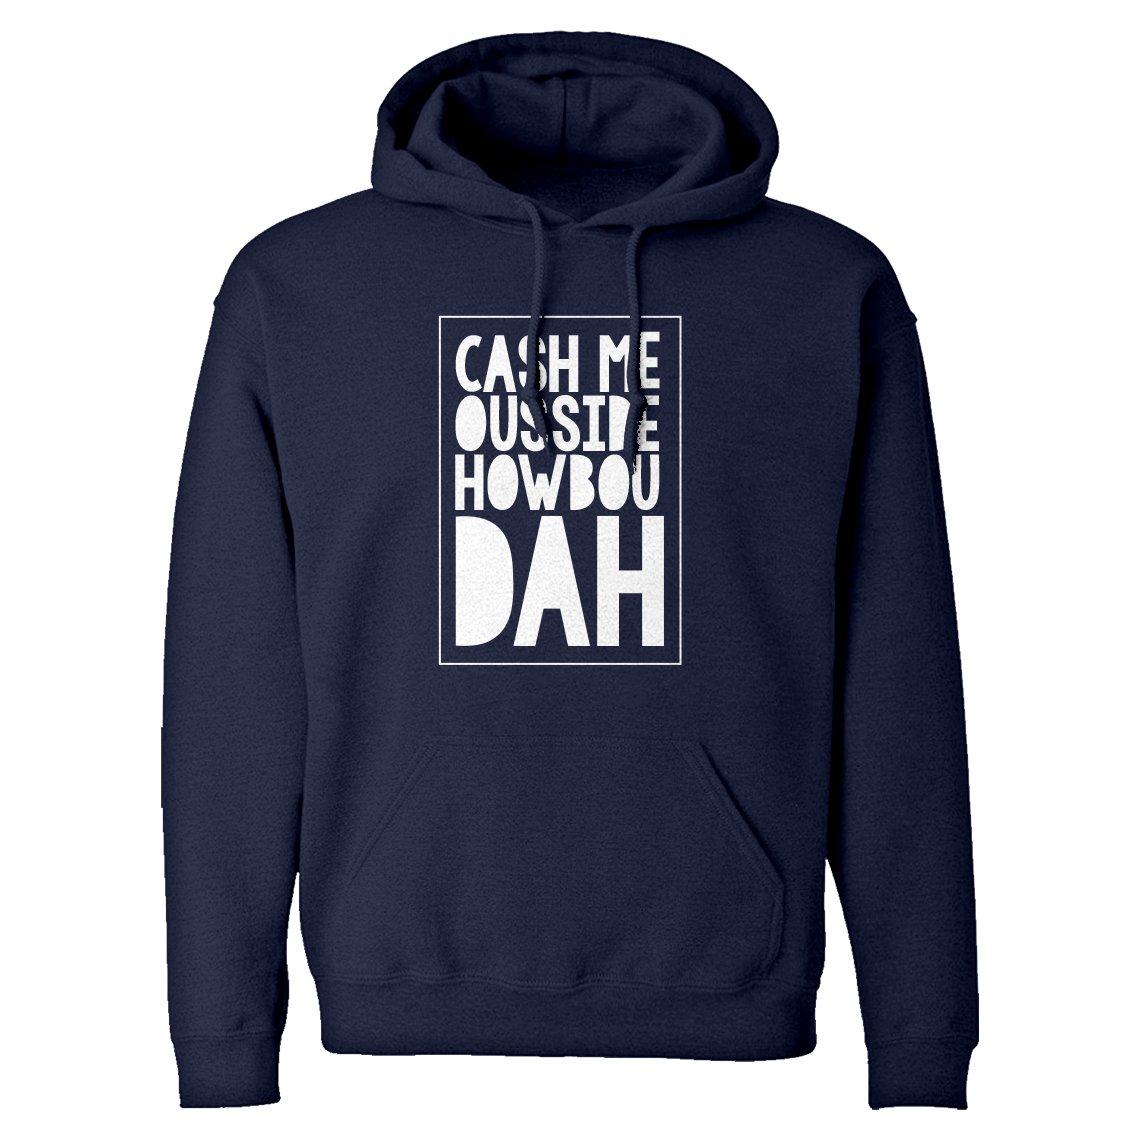 Indica Plateau Cash Me Ousside How Bow Dah Unisex Adult Hoodie